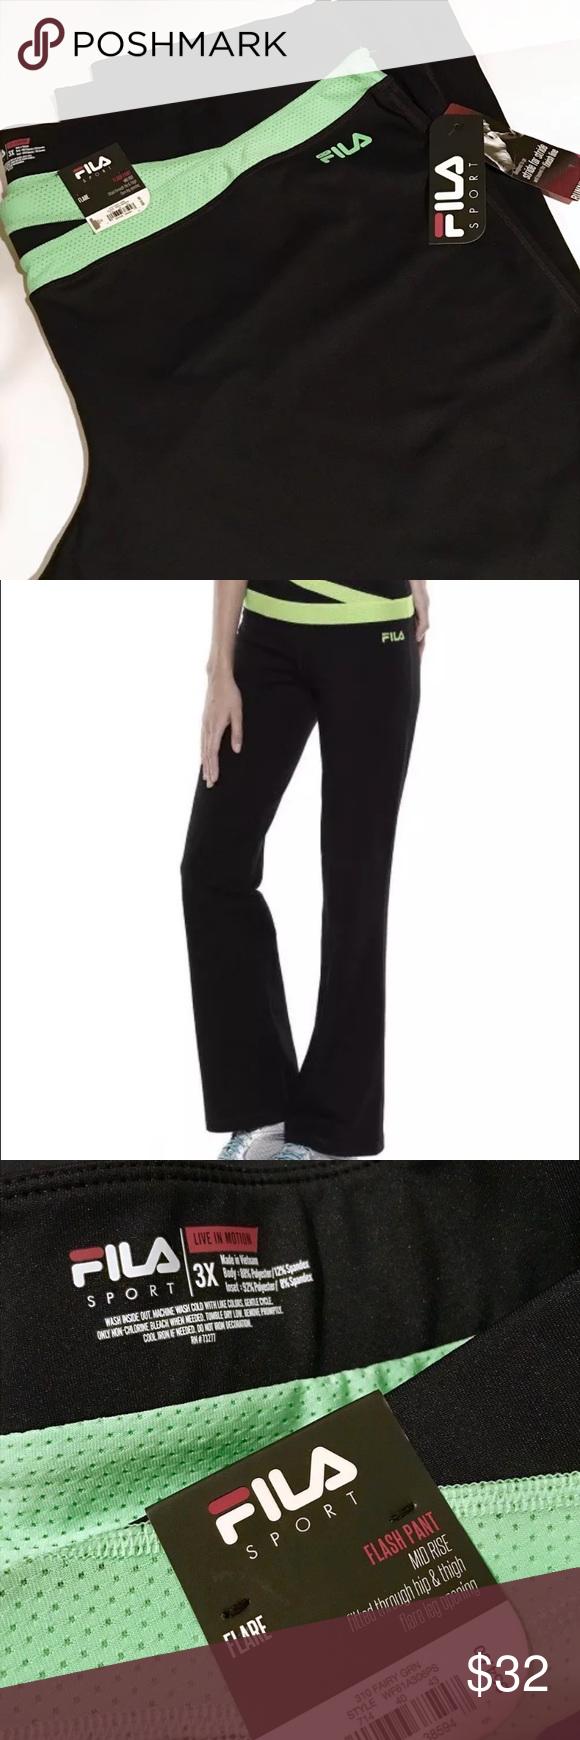 NWT FILA SPORT Flash Pants Authentic FILA SPORT FLASH